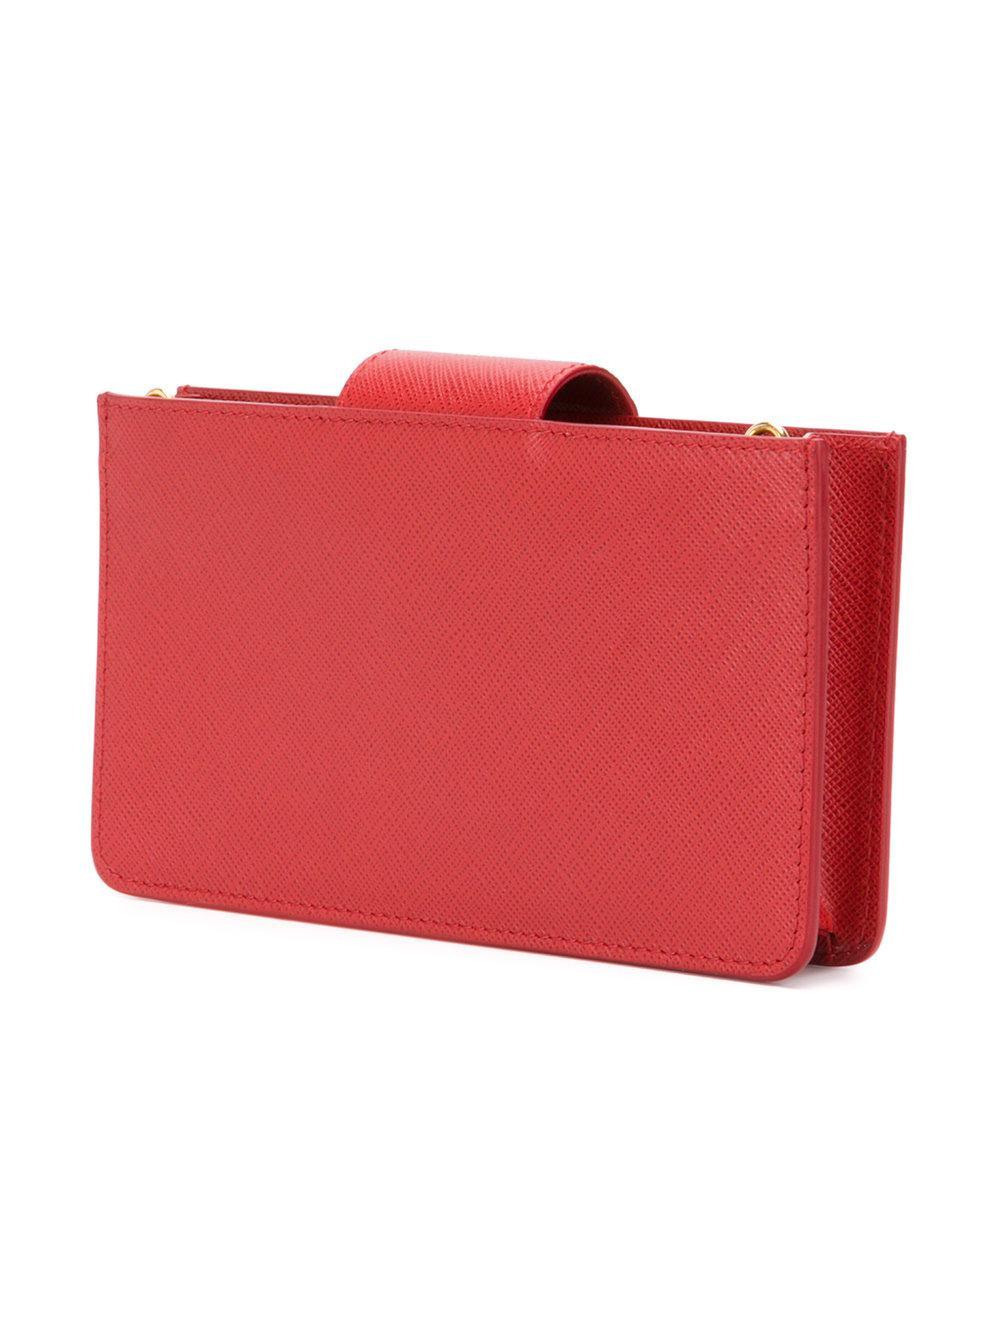 Prada Leather Saffiano Cross-body Bag in Red